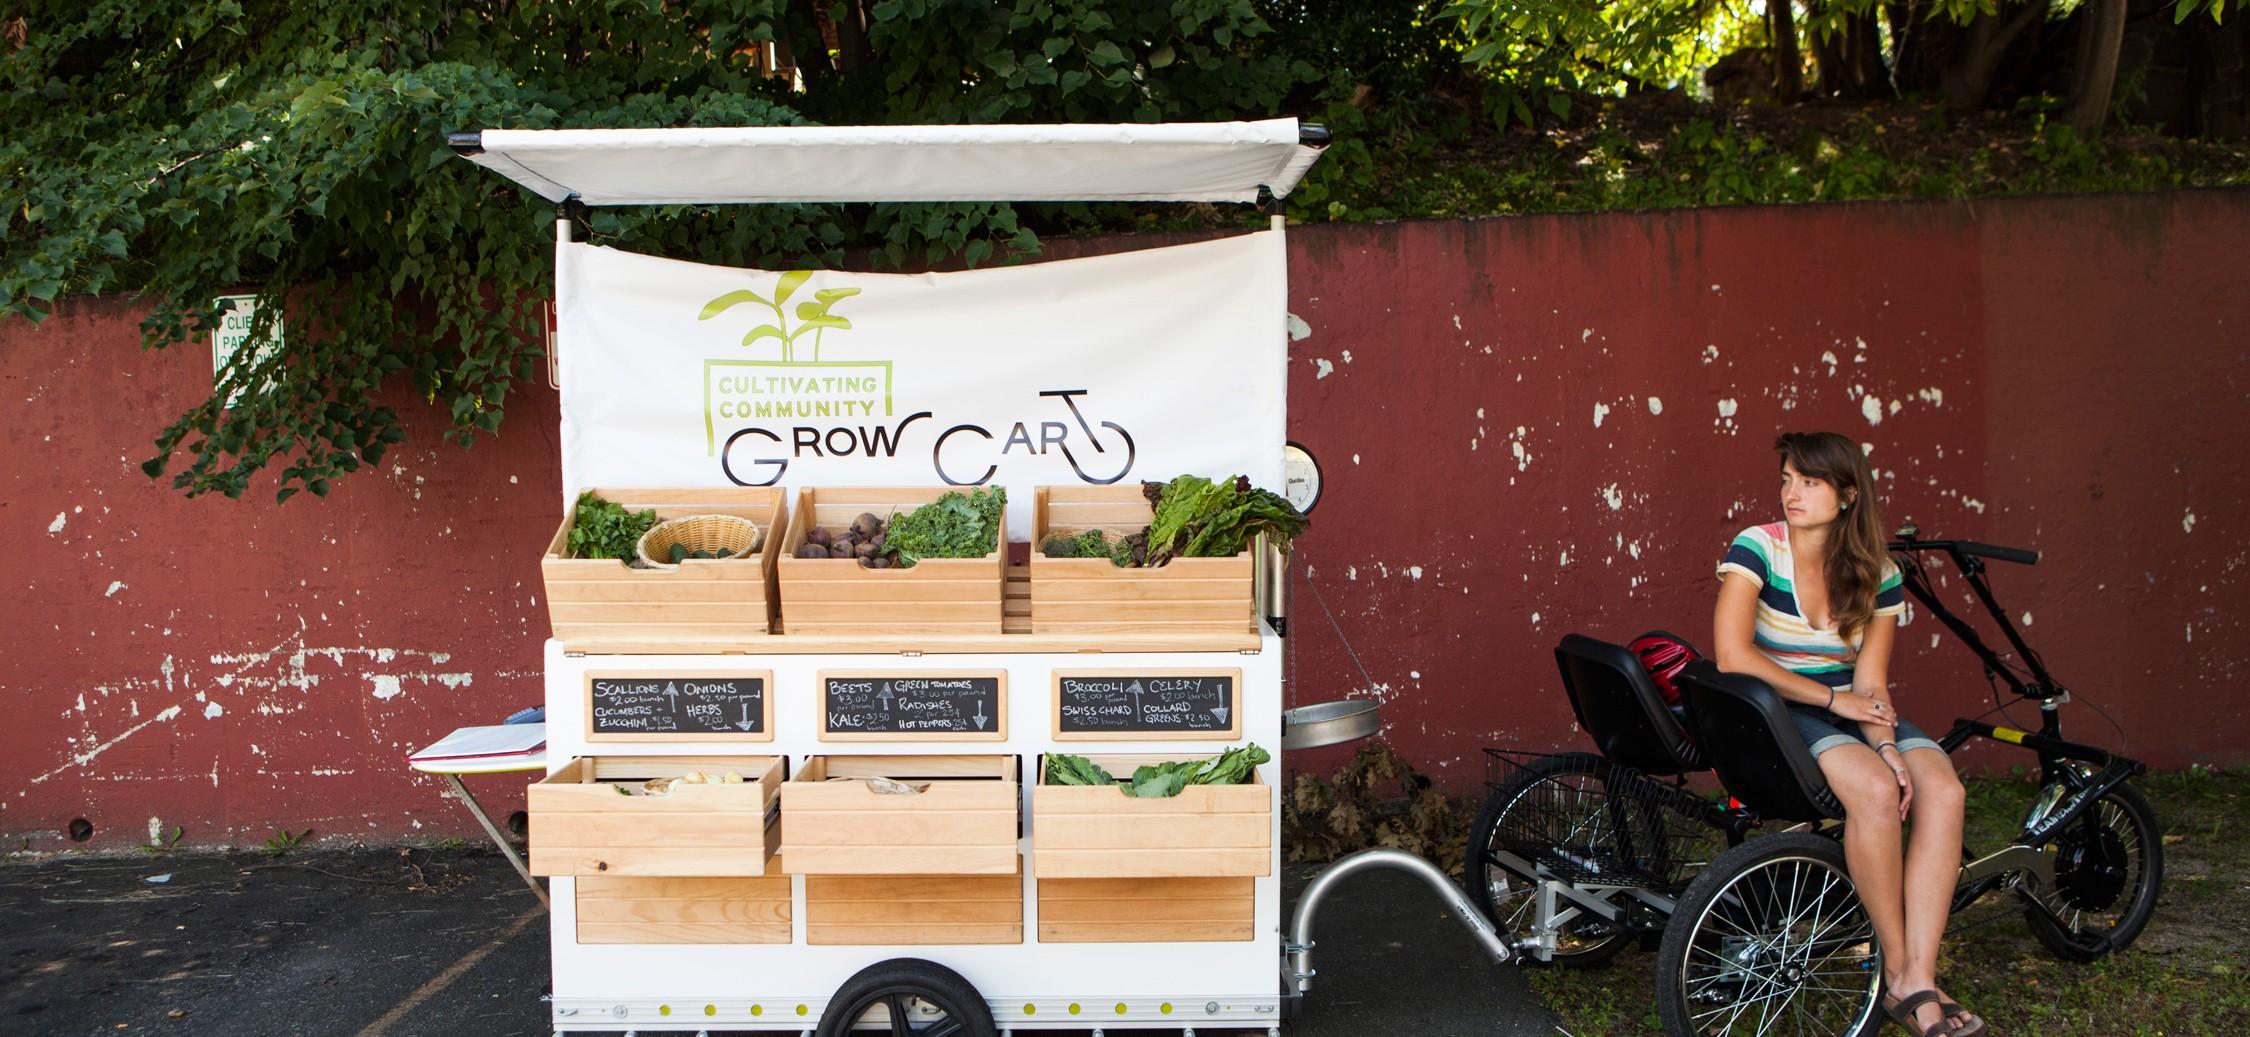 Cultivating Community Grow Cart Hannah Merchant